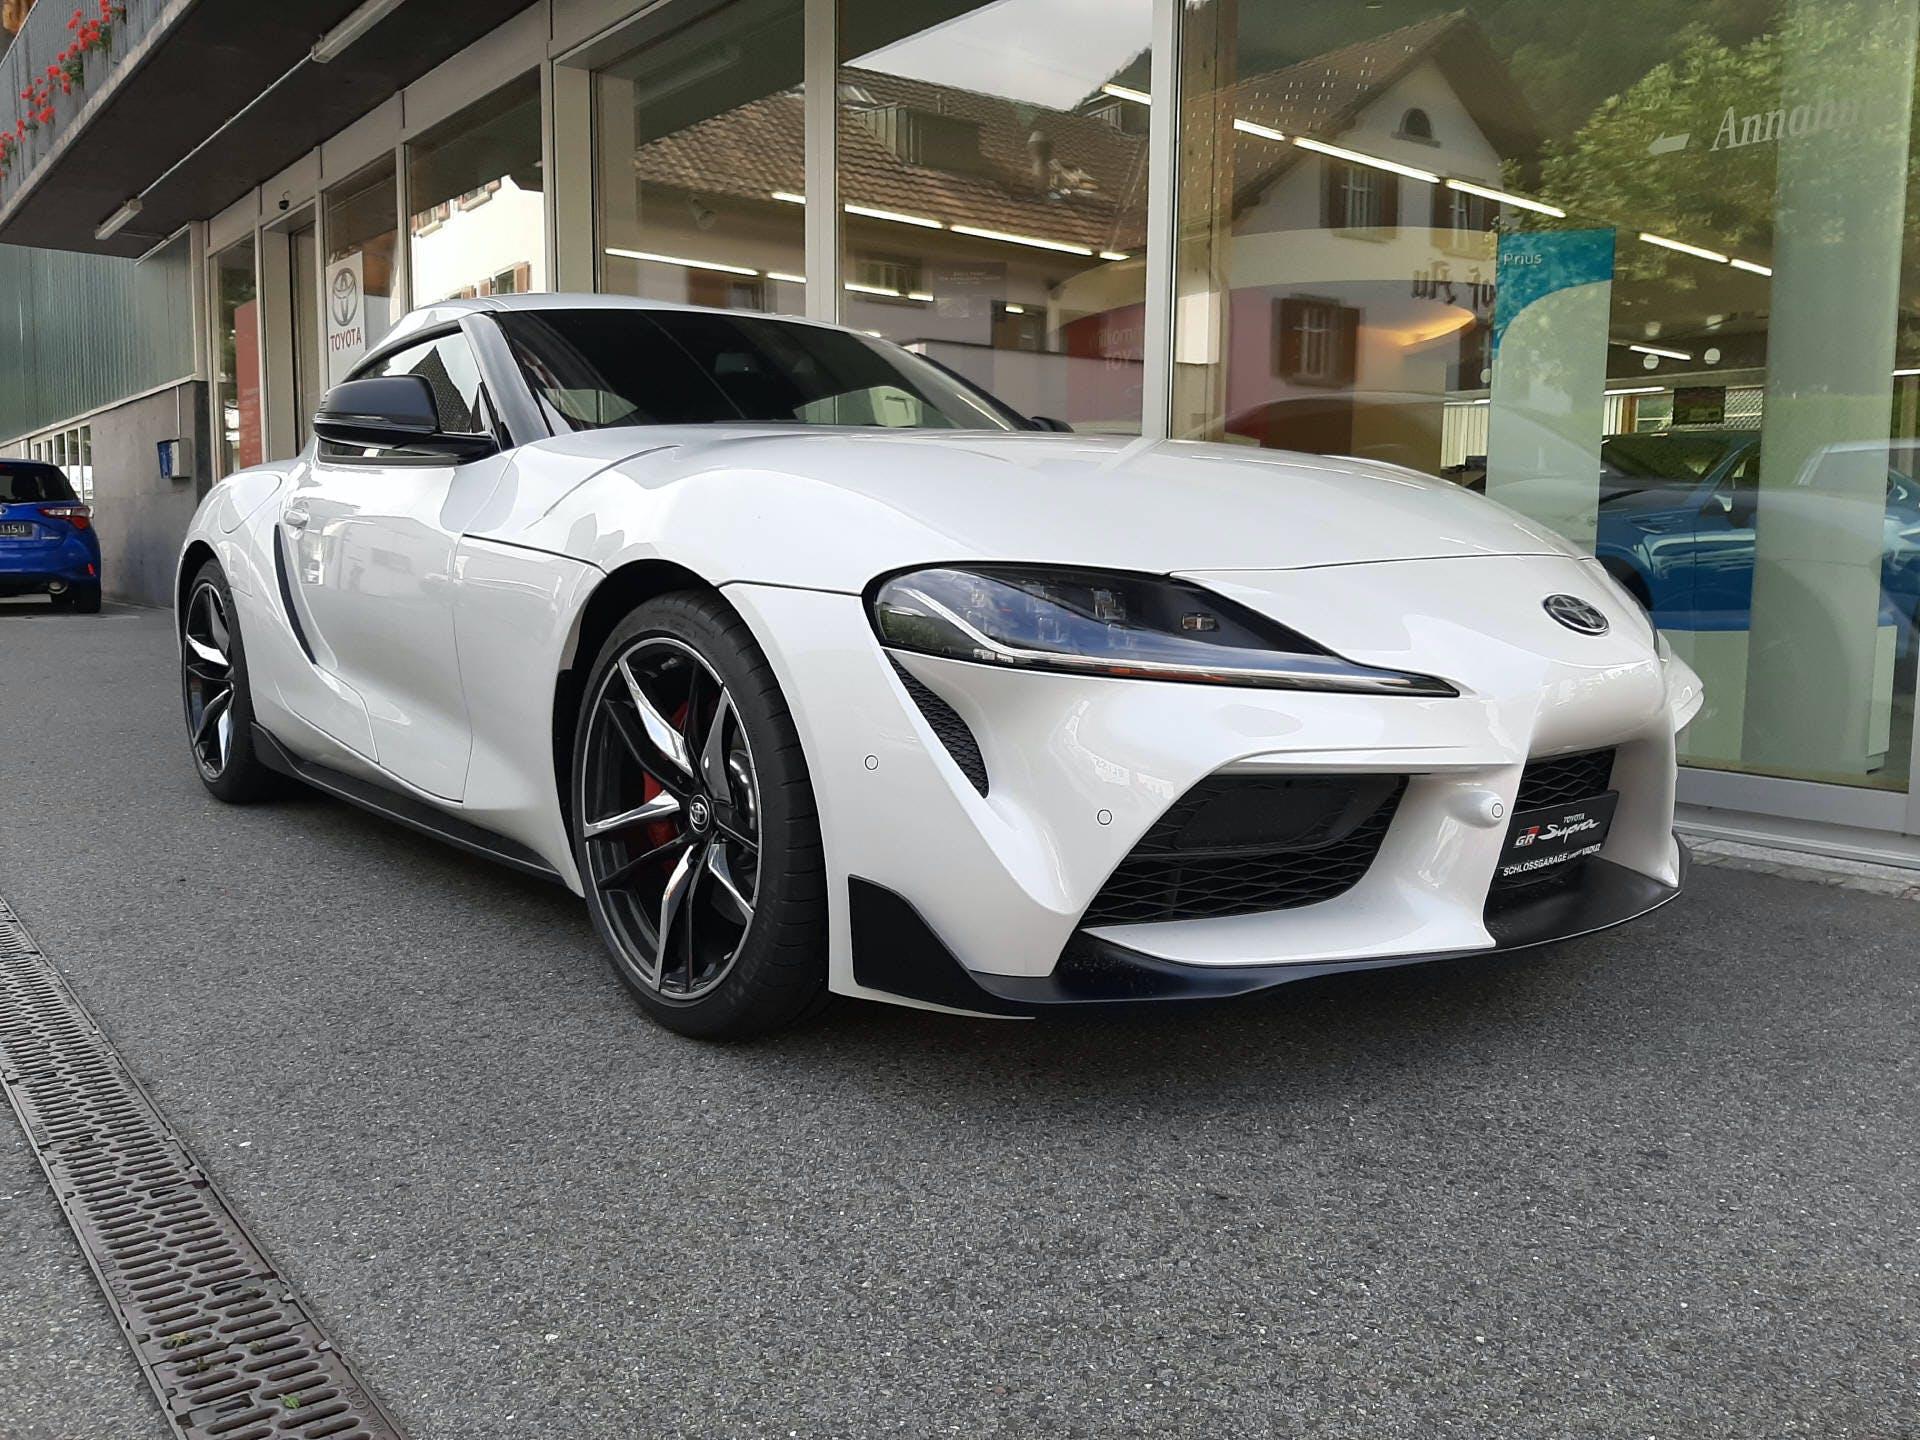 coupe Toyota Supra 3.0 GR T Premium